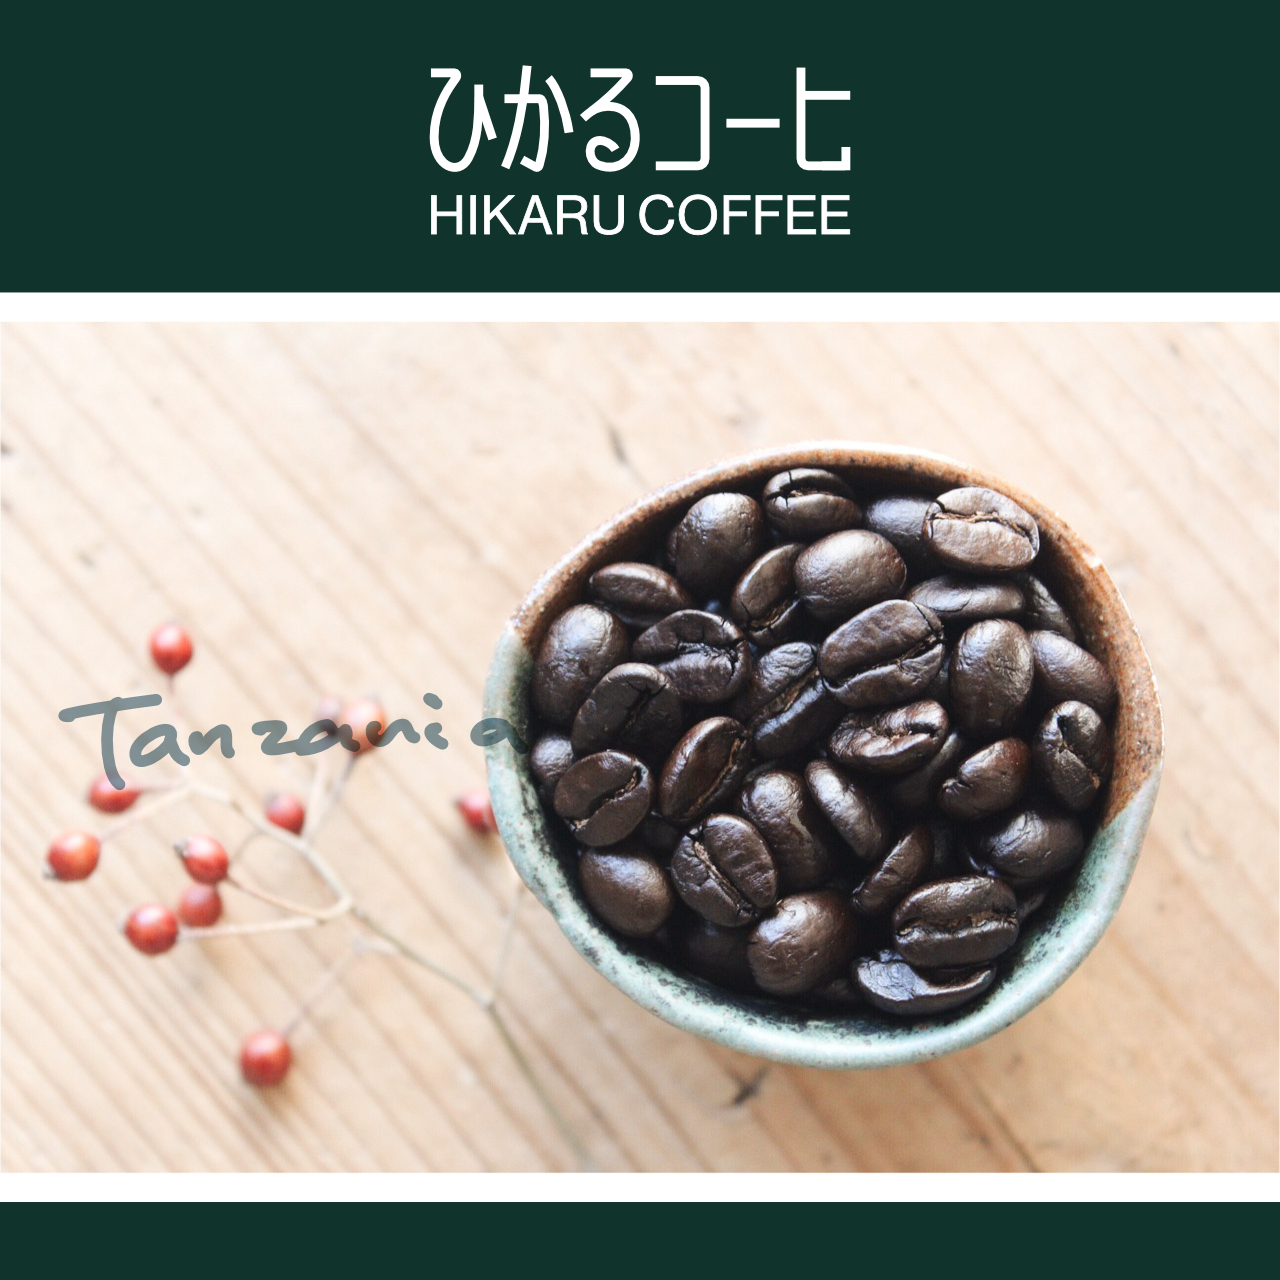 消費 税 豆 コーヒー